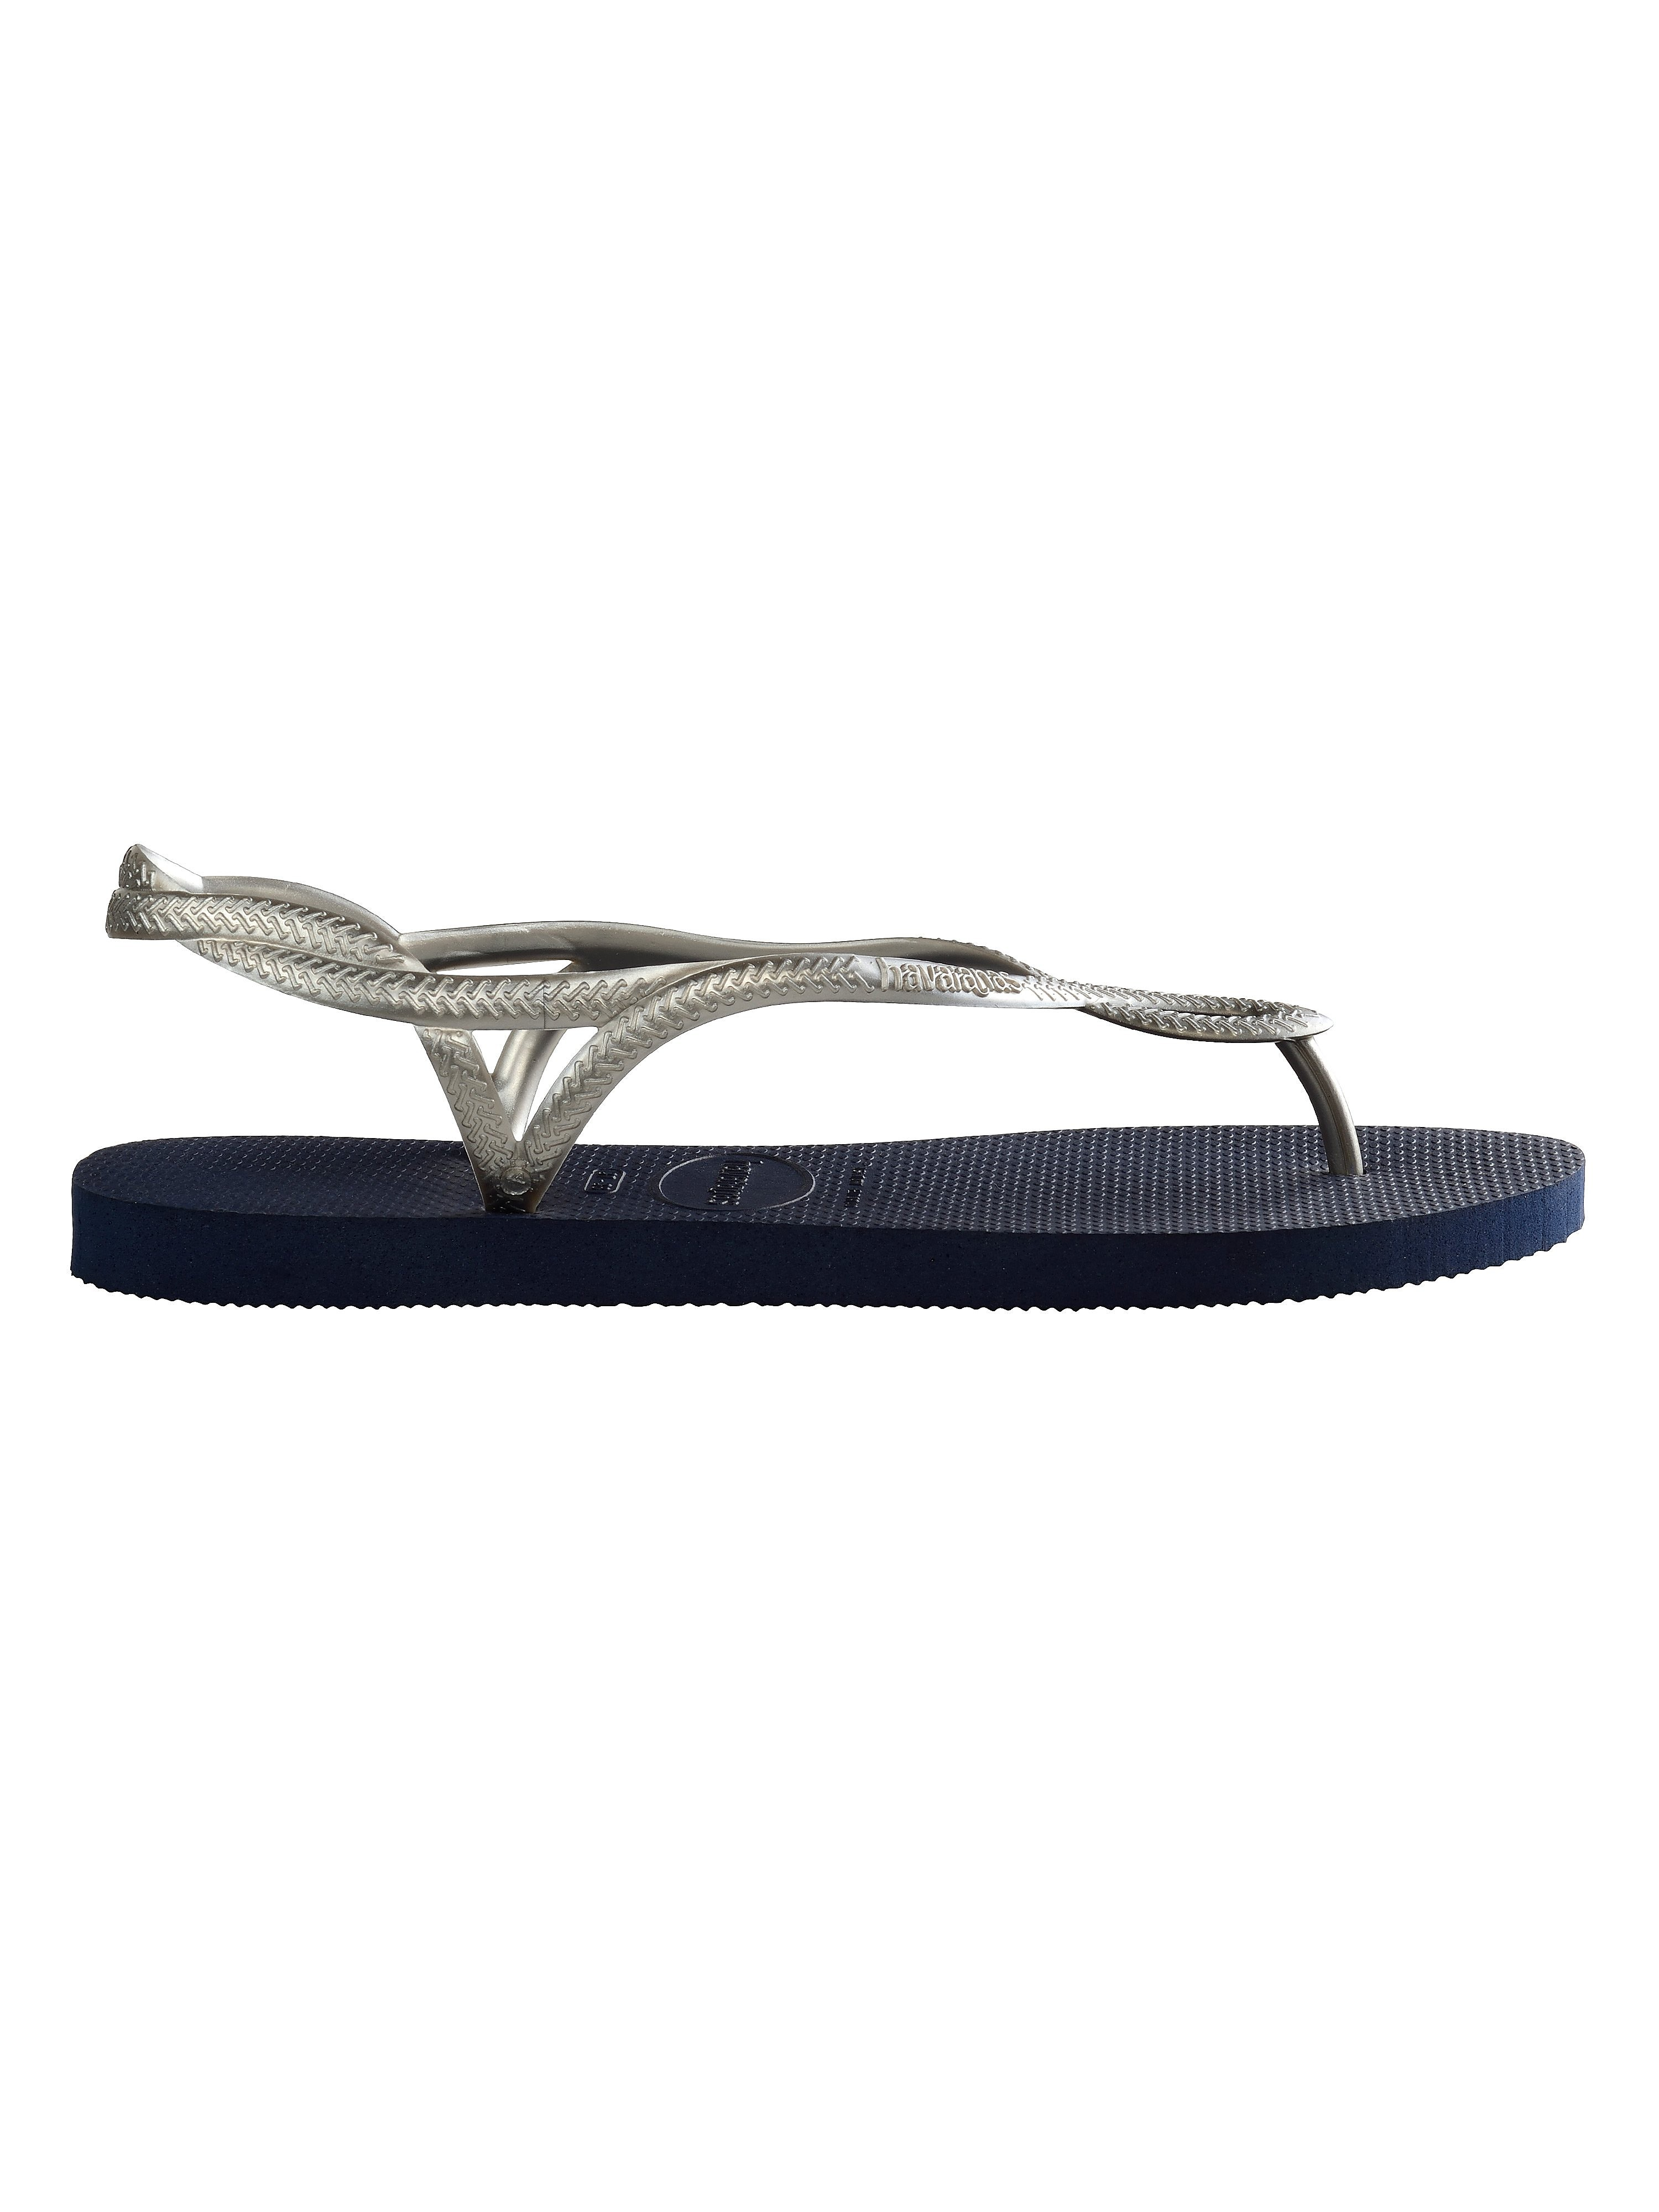 Havaianas Women's Luna Flip Flops - Navy/Silver